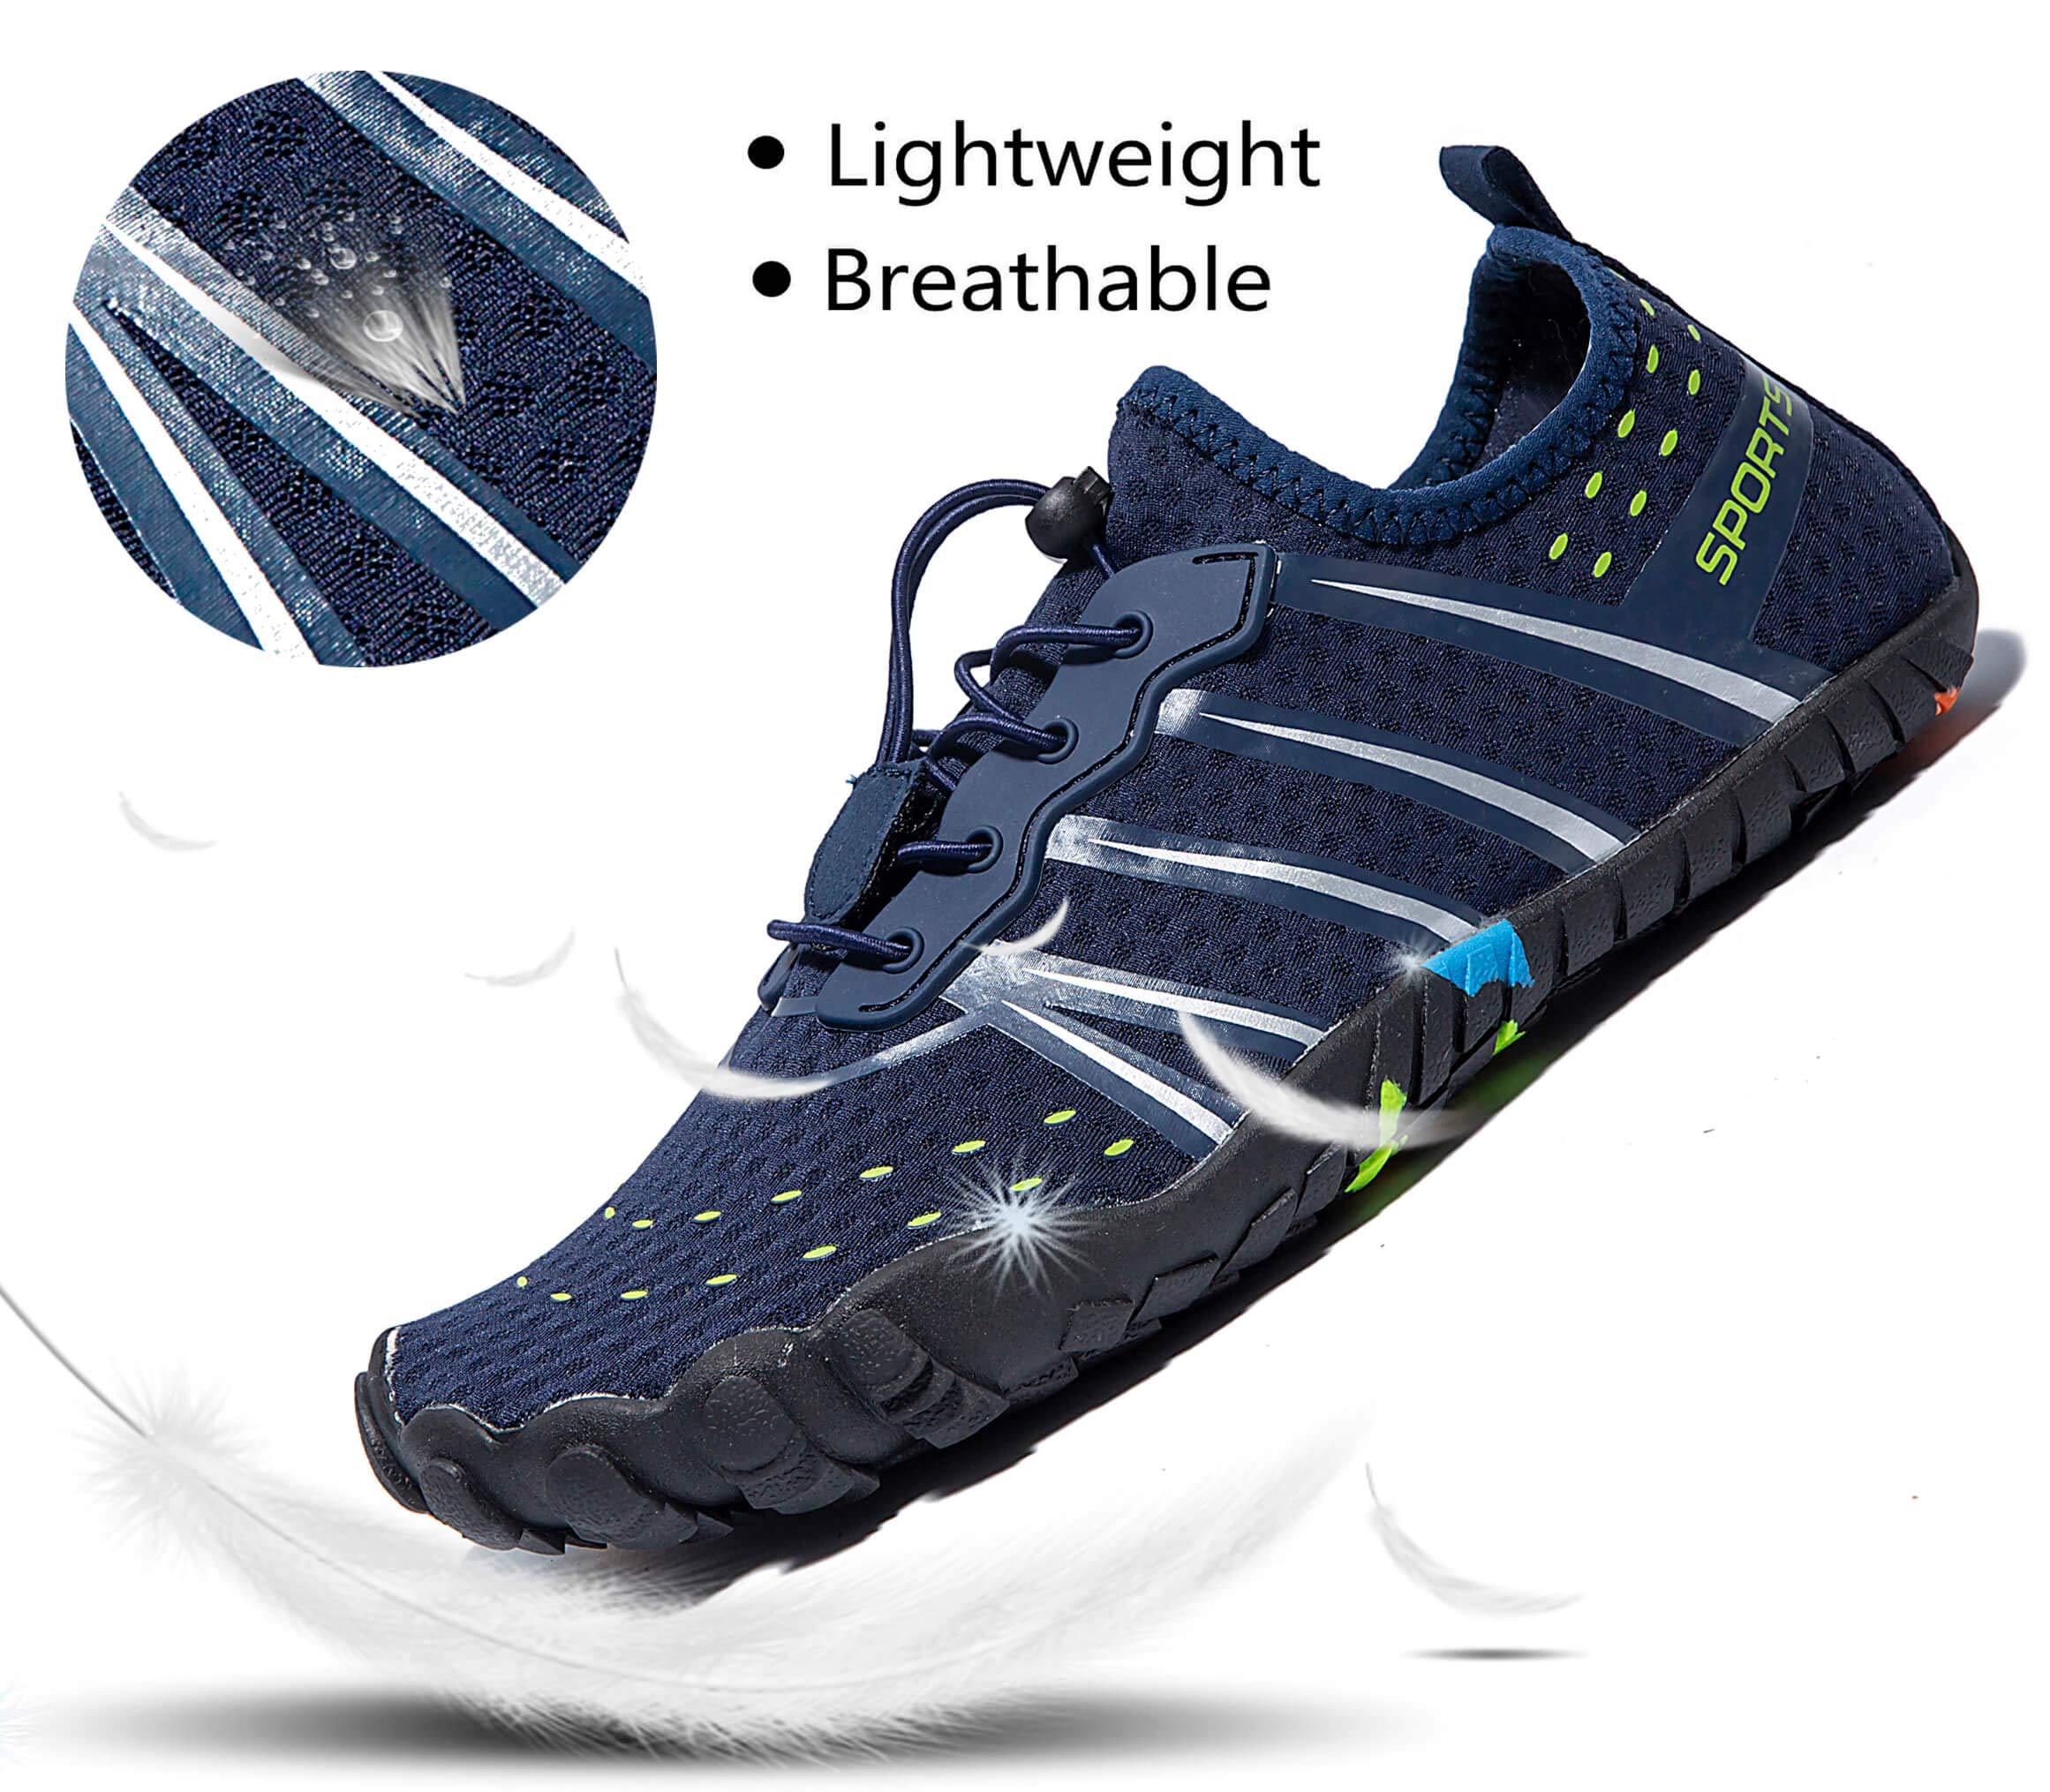 LINGTOM Mens Womens Aqua Water Shoes Quick Dry Barefoot Sports Exercise for Walking Swimming Diving Beach Surf Pool Yoga,Dark Blue 12.5 M US Women / 11 M US Men by LINGTOM (Image #3)